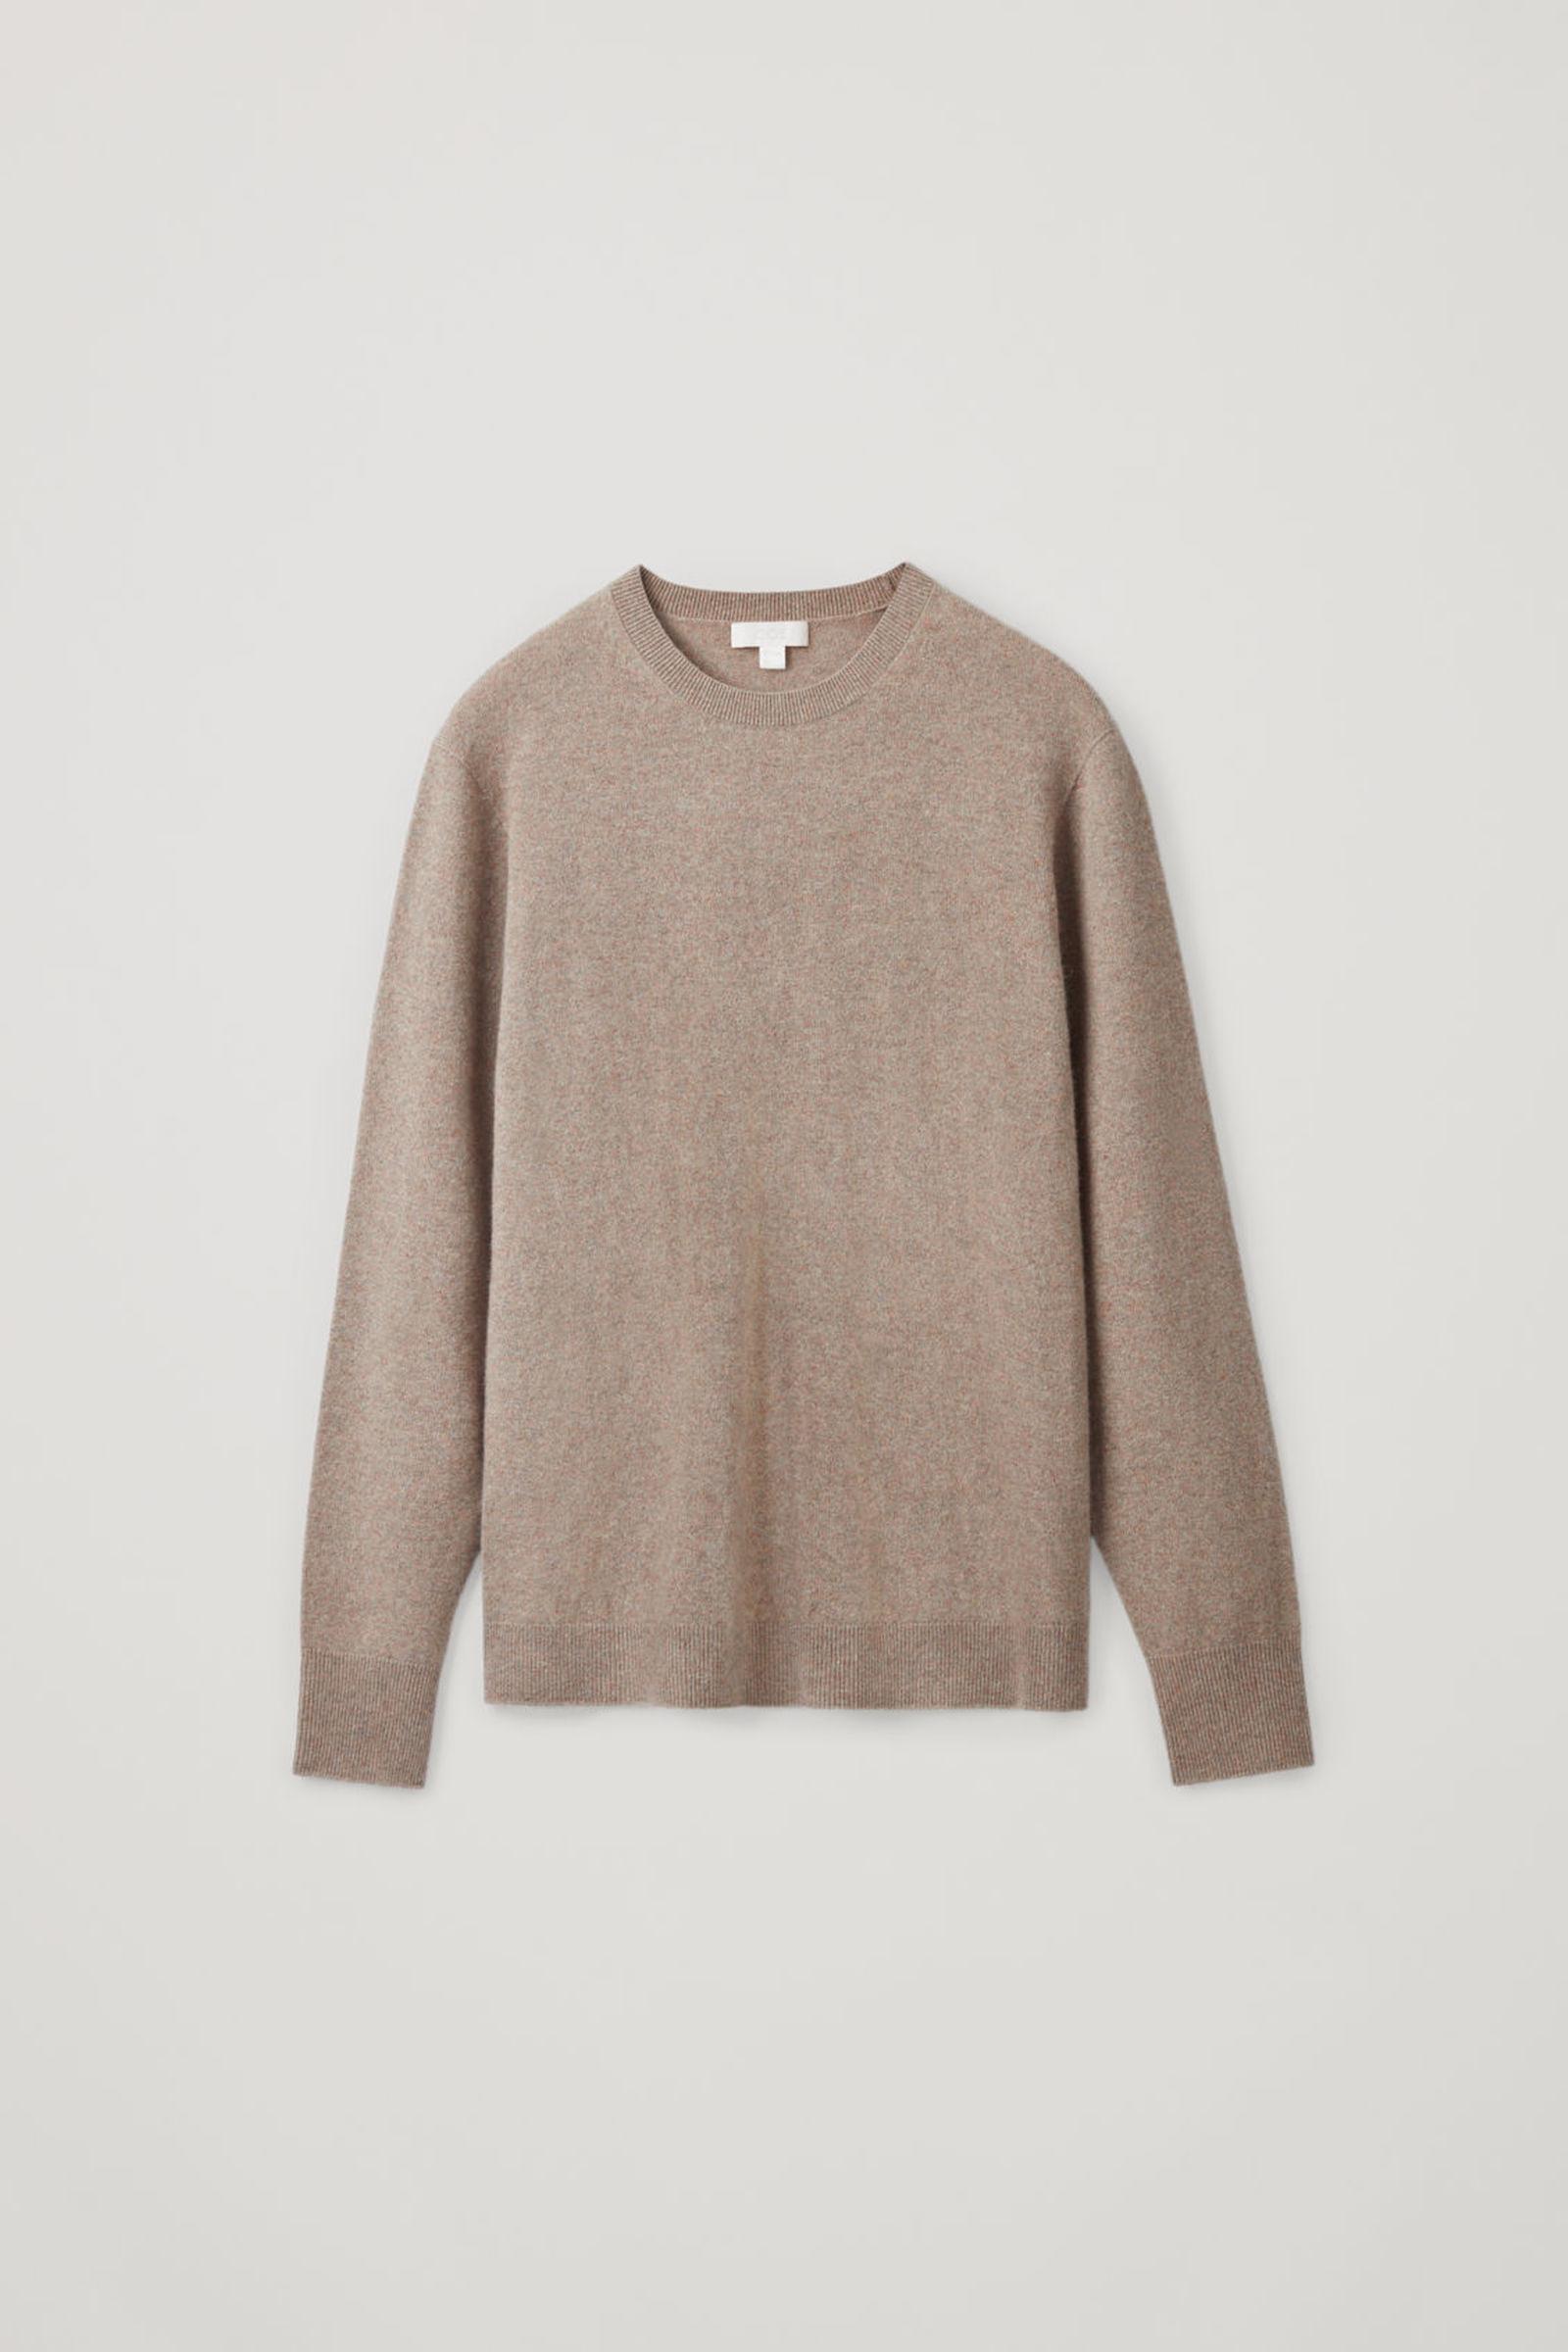 COS 유니섹스 리퍼포스드 캐시미어 스웨터의 라이트 브라운컬러 Product입니다.